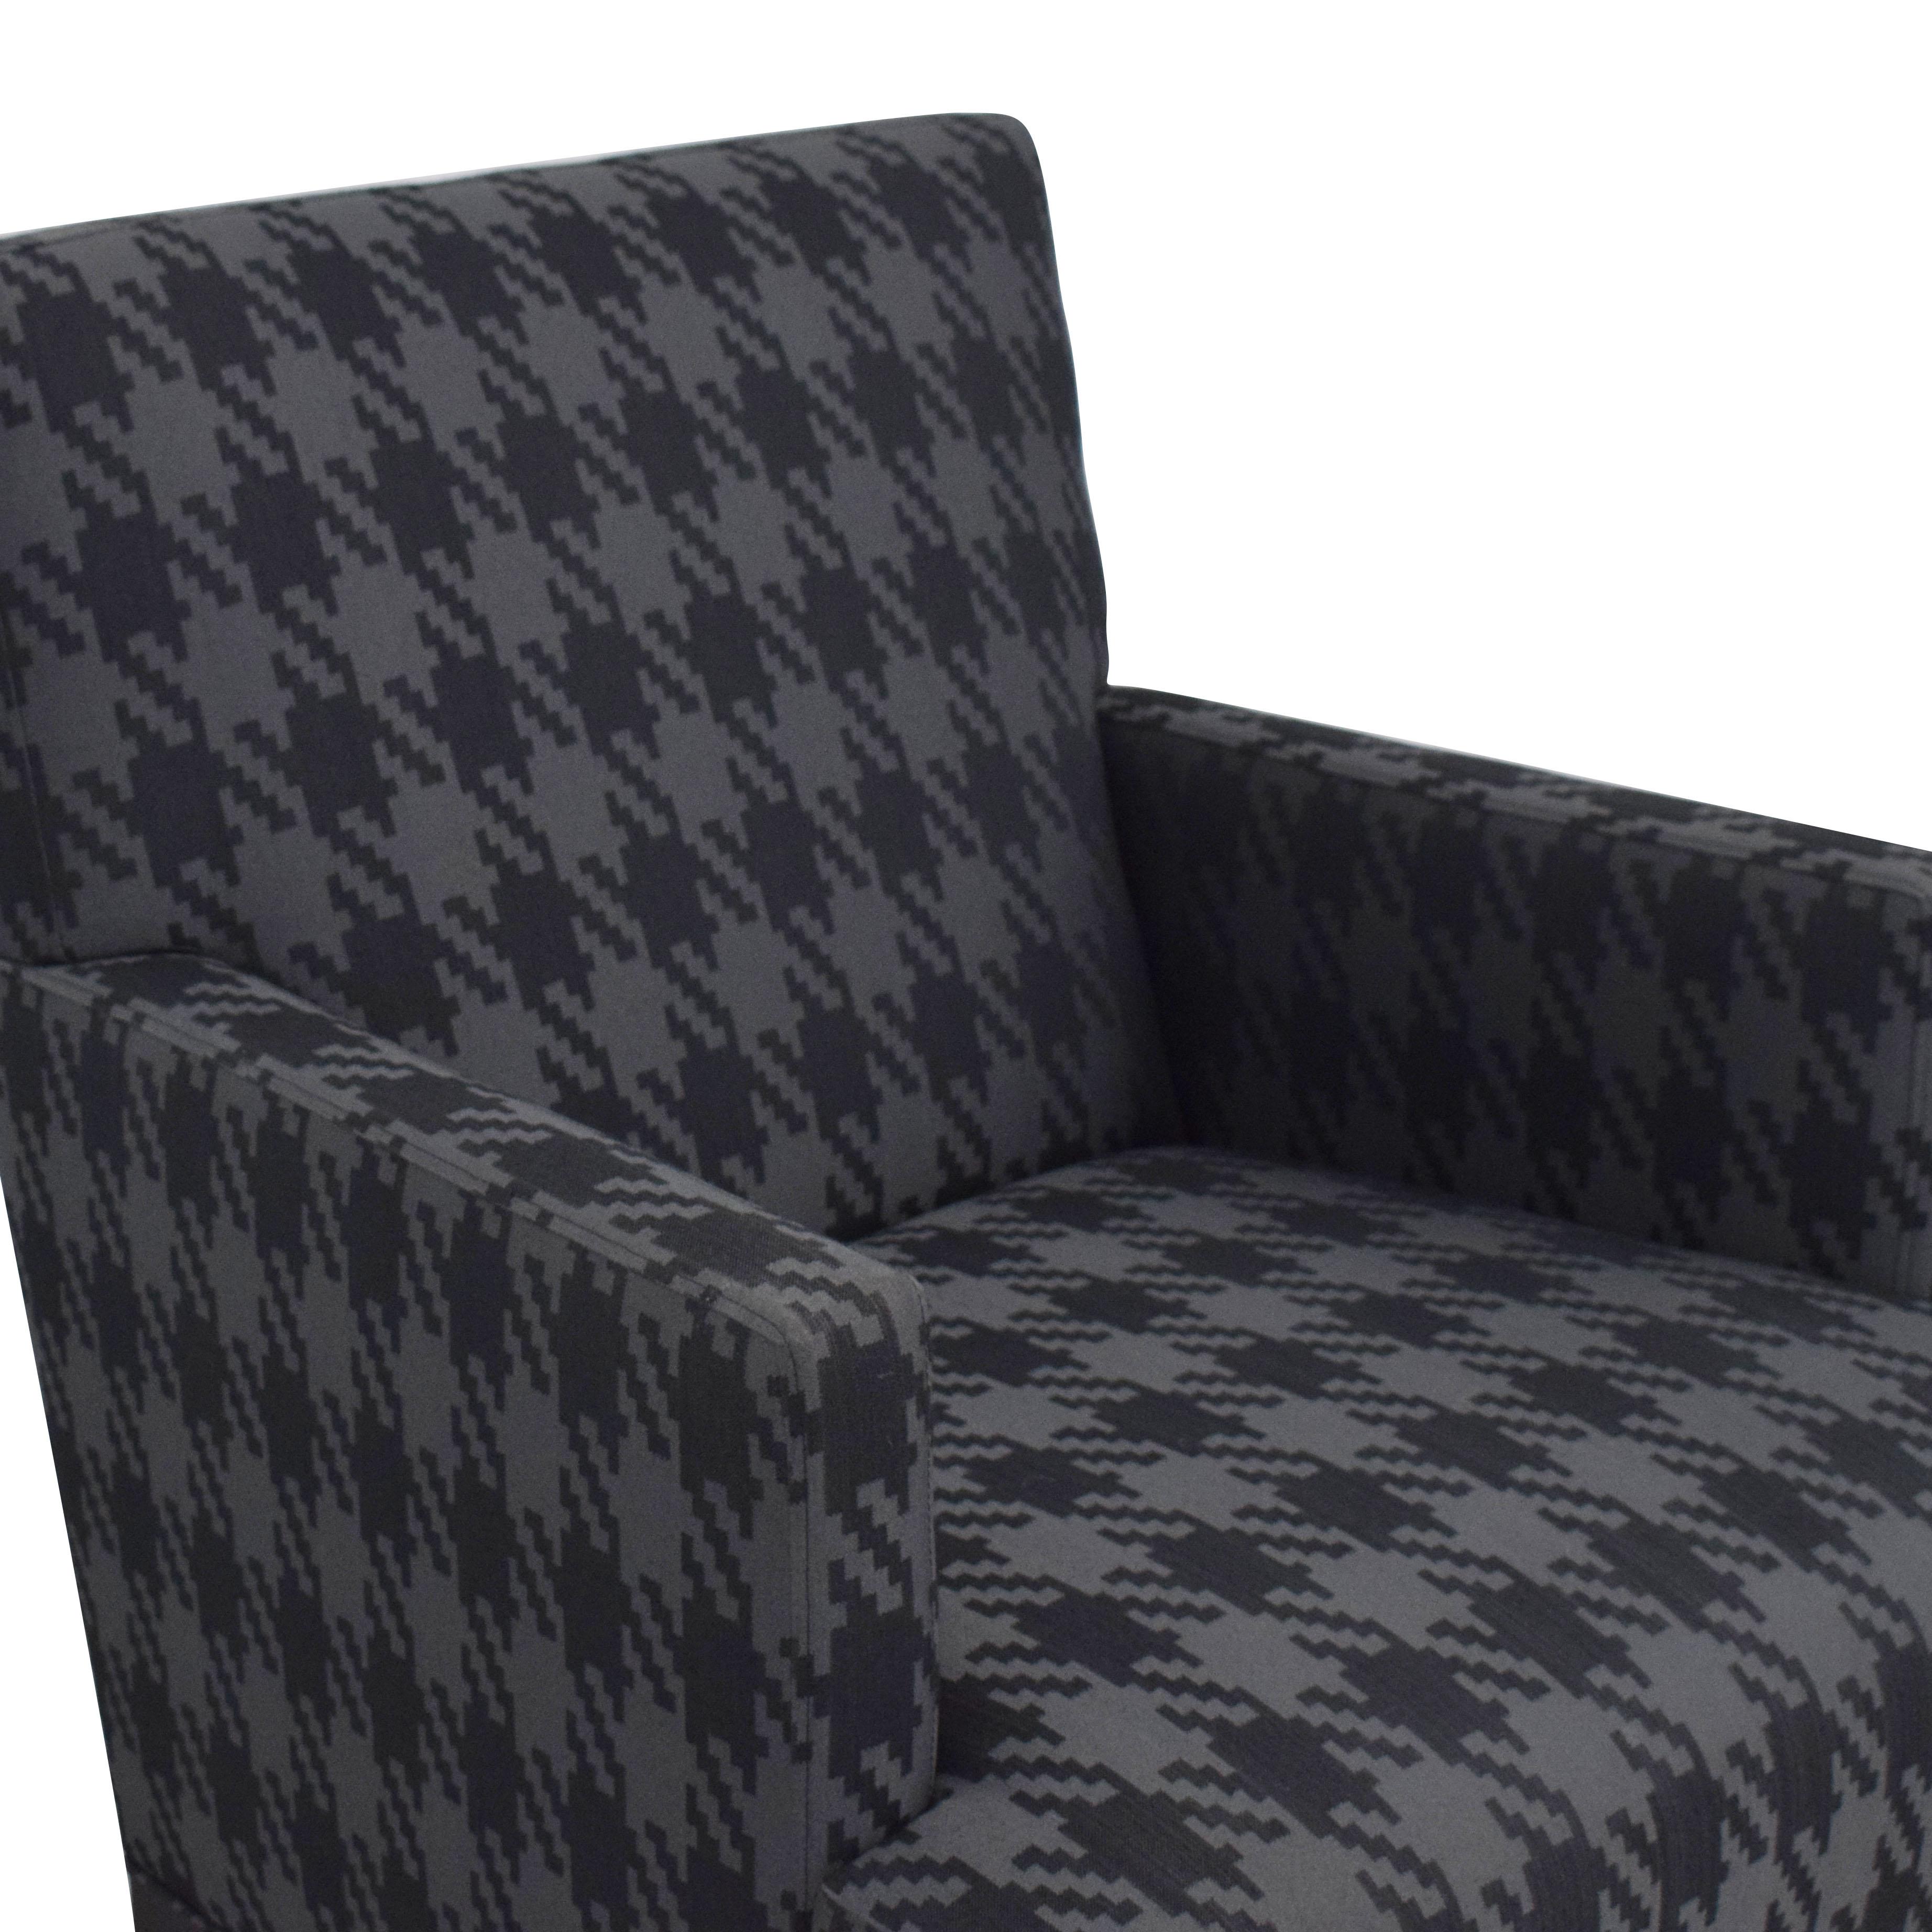 shop Crate & Barrel Armchair Crate & Barrel Chairs